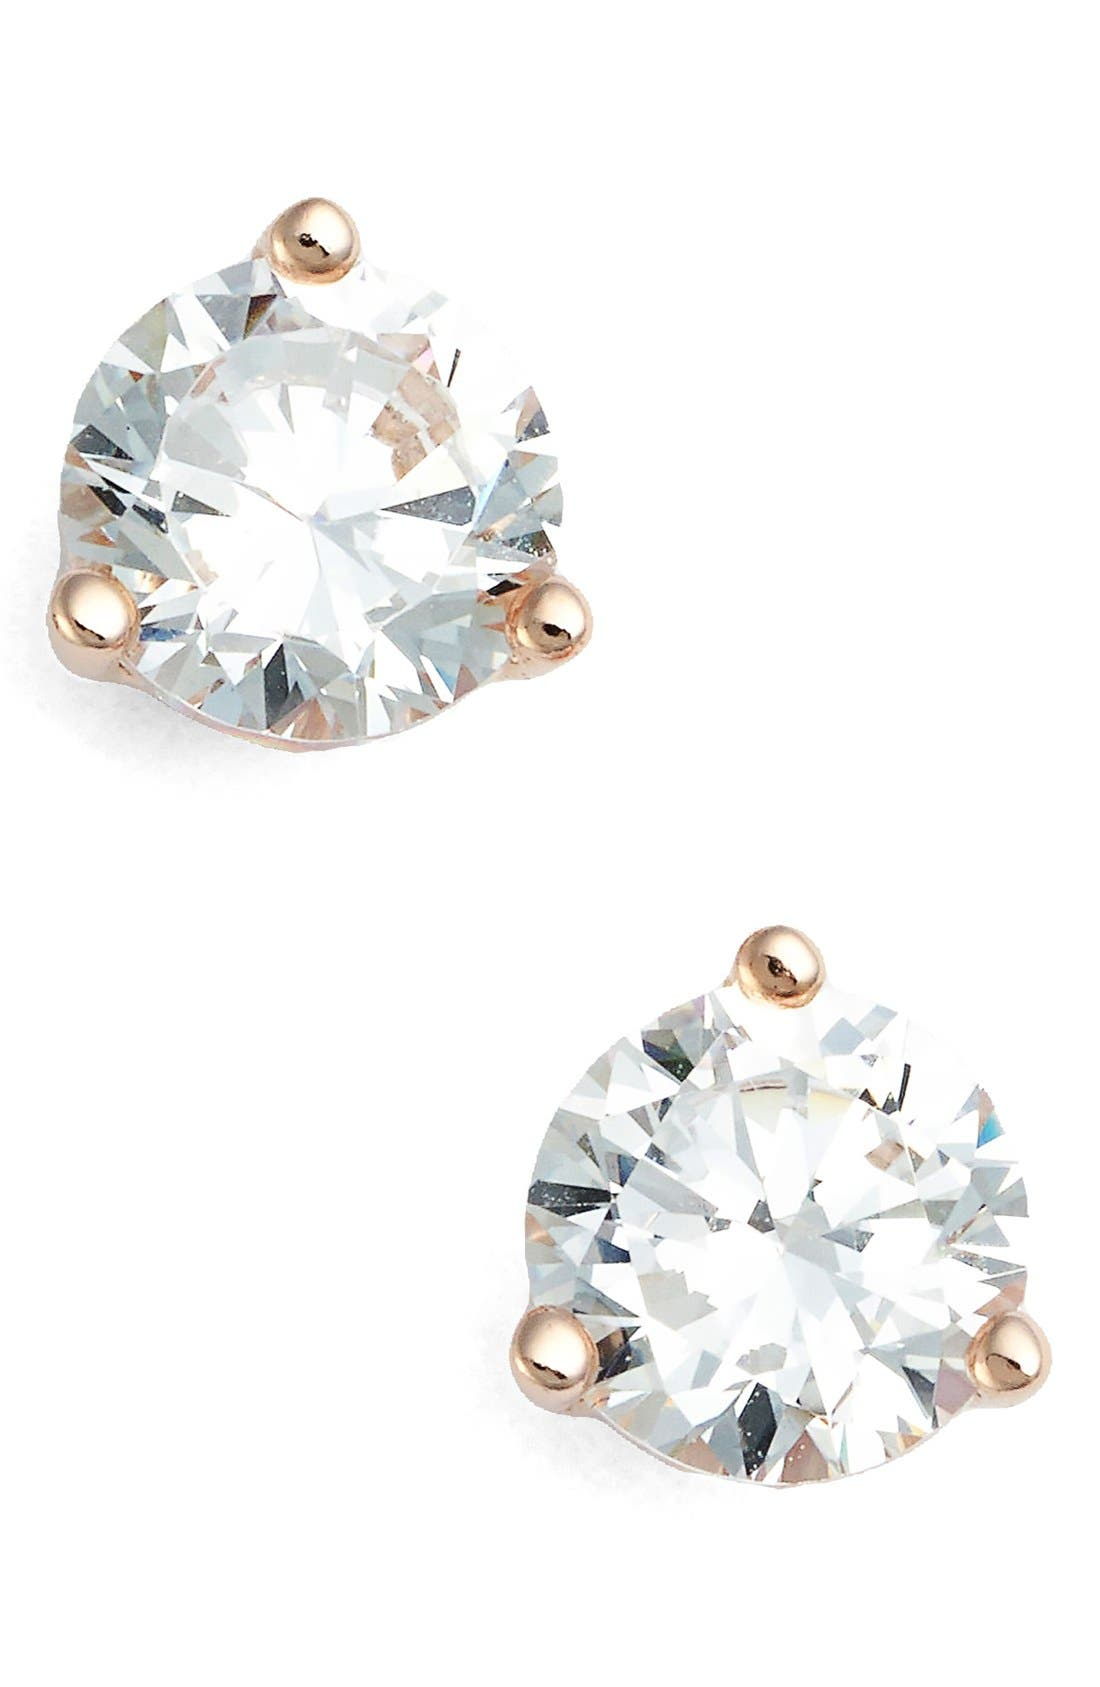 Nordstrom Precious Metal Plated 1ct tw Cubic Zirconia Earrings